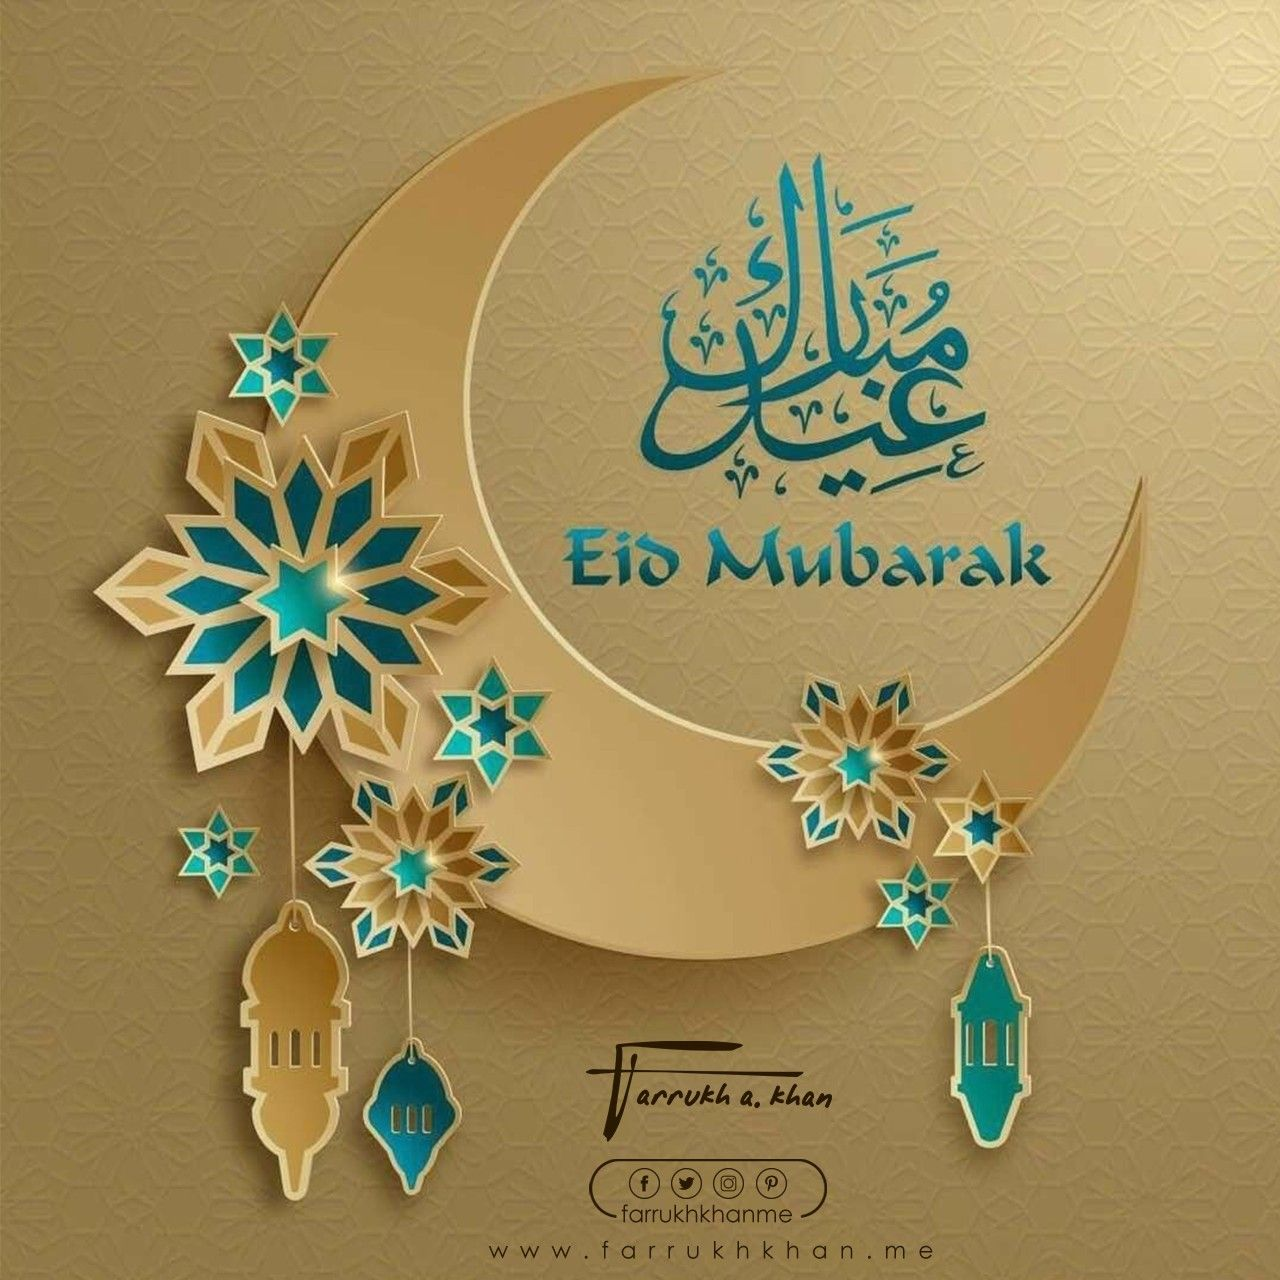 السلام علیکم الله رب العزت آپ سب کو إيمان كامل صحت و عافیت کیساتھ ہم آمين رمضان المبارک کی رحمتوں Eid Adha Mubarak Eid Mubarak Greetings Eid Mubarak Wishes